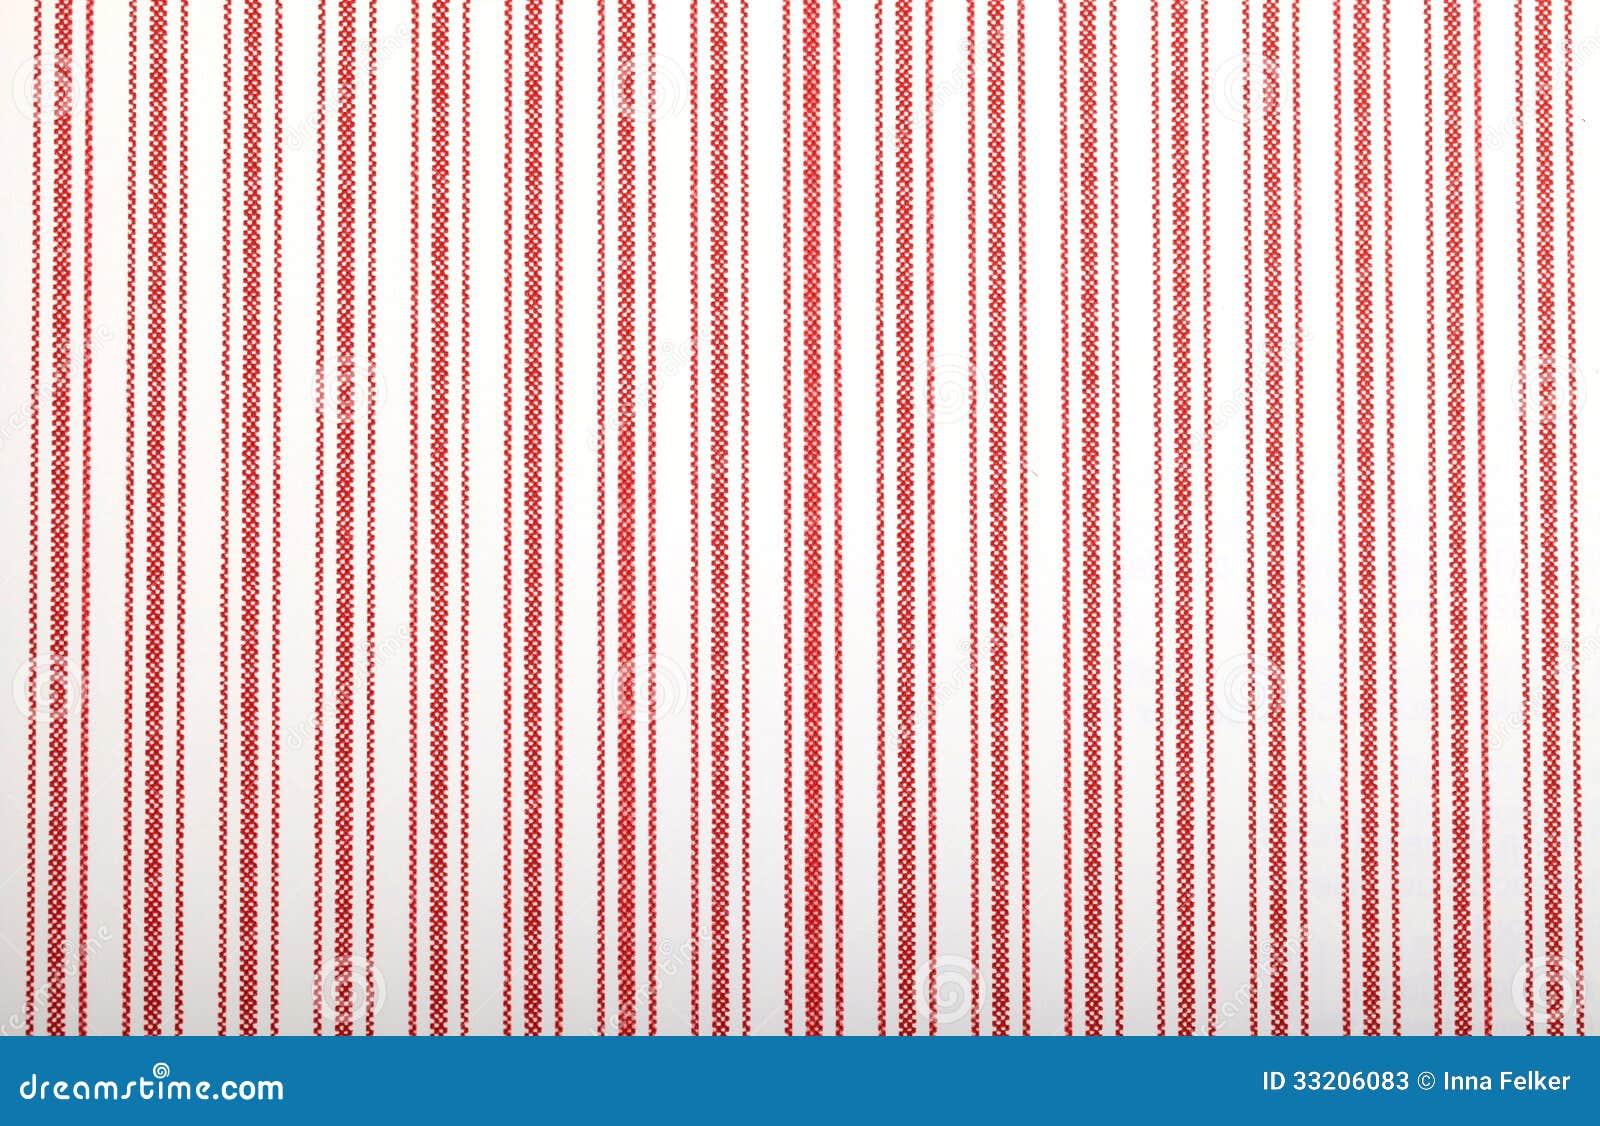 Papel de empapelar con el modelo rayado rojo imagen de for Papel empapelar pared